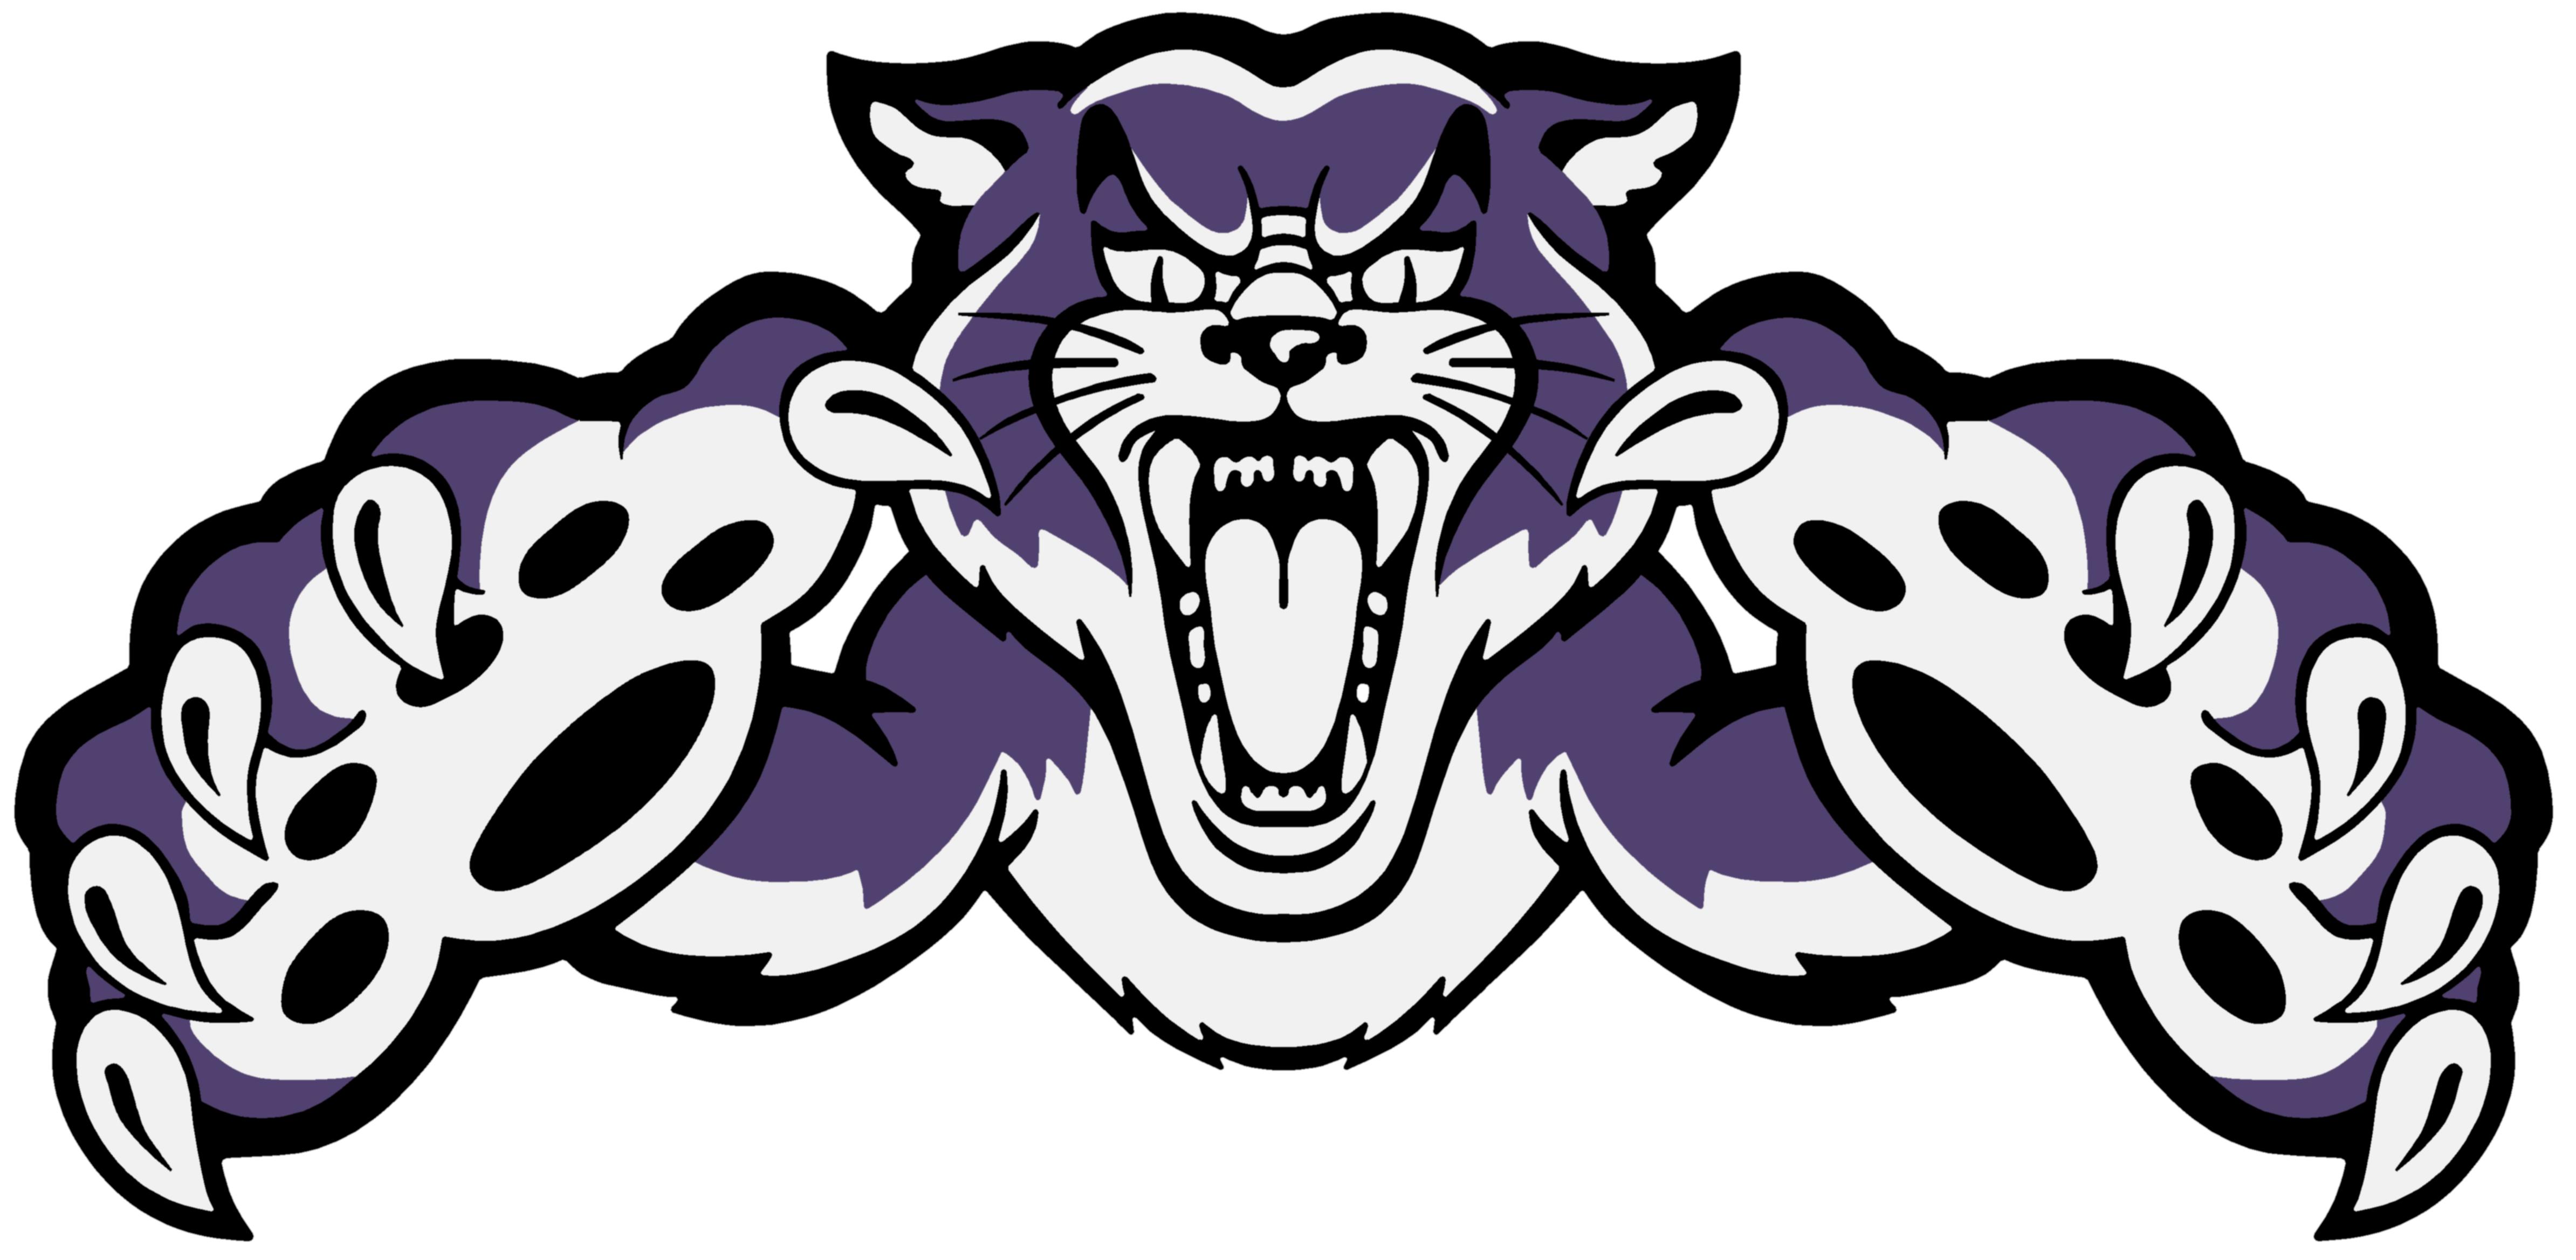 Wildcat Mascot Logo 355199 Png 4777 2337 Wildcats Logo Wild Cats Unicorn Wallpaper Cute